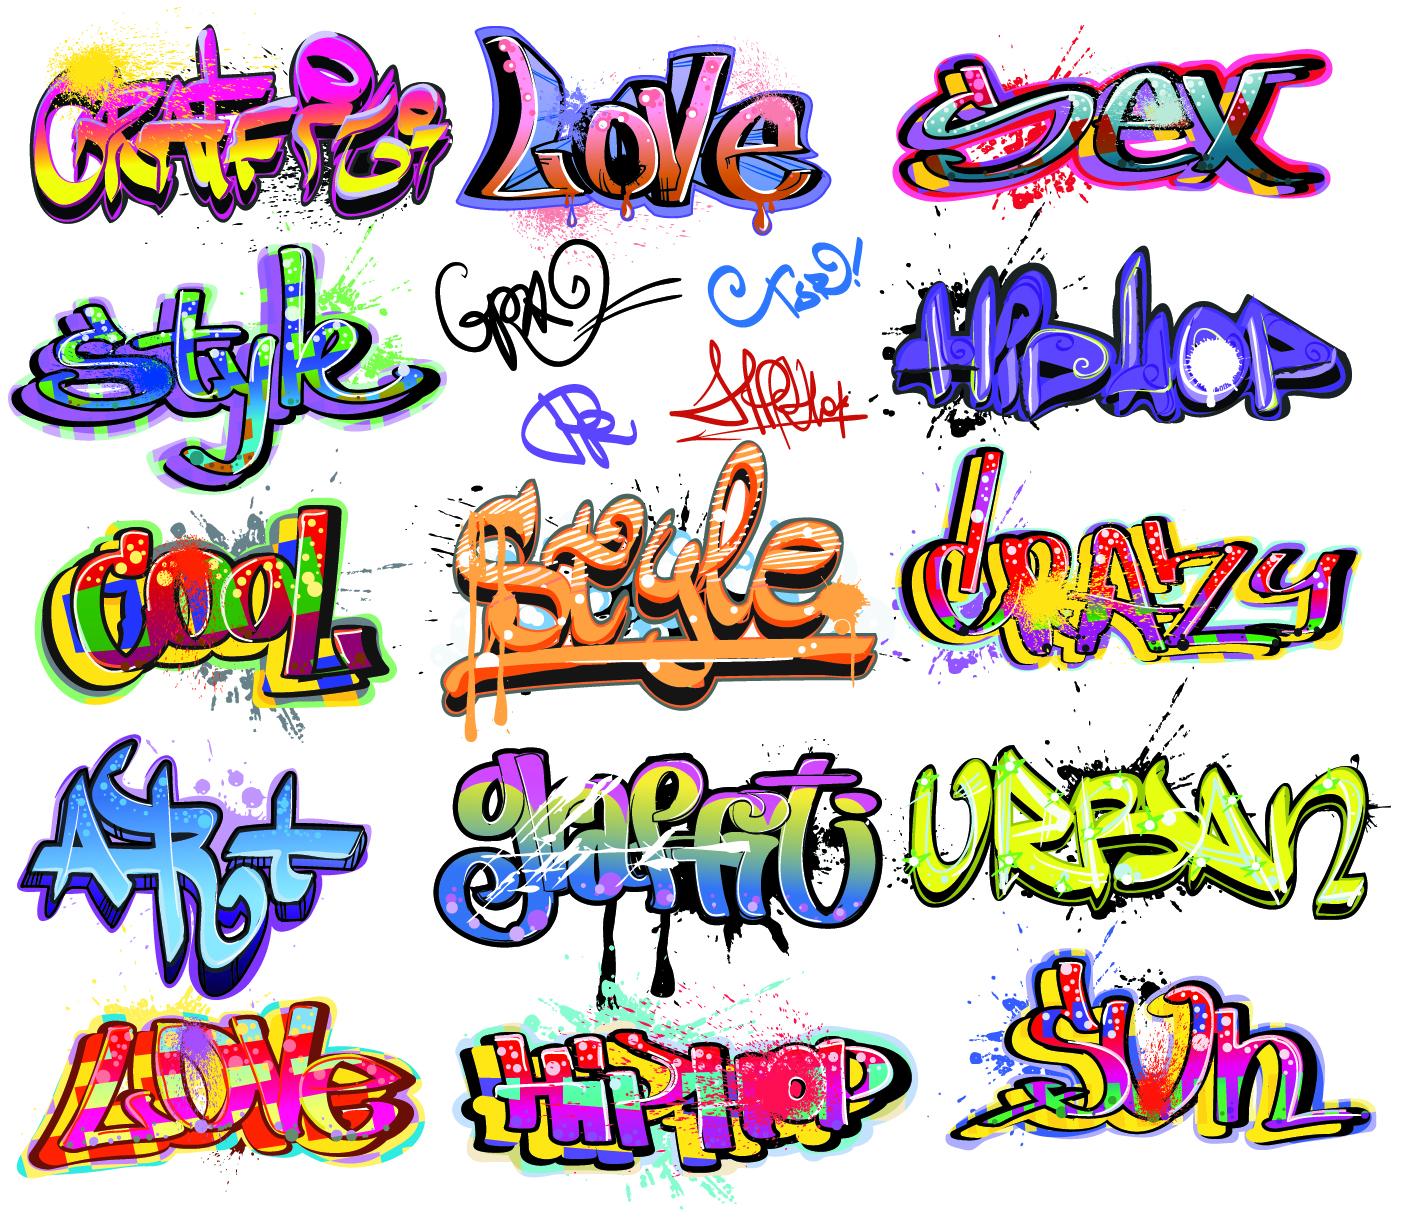 14 Graffiti Vector Font Images